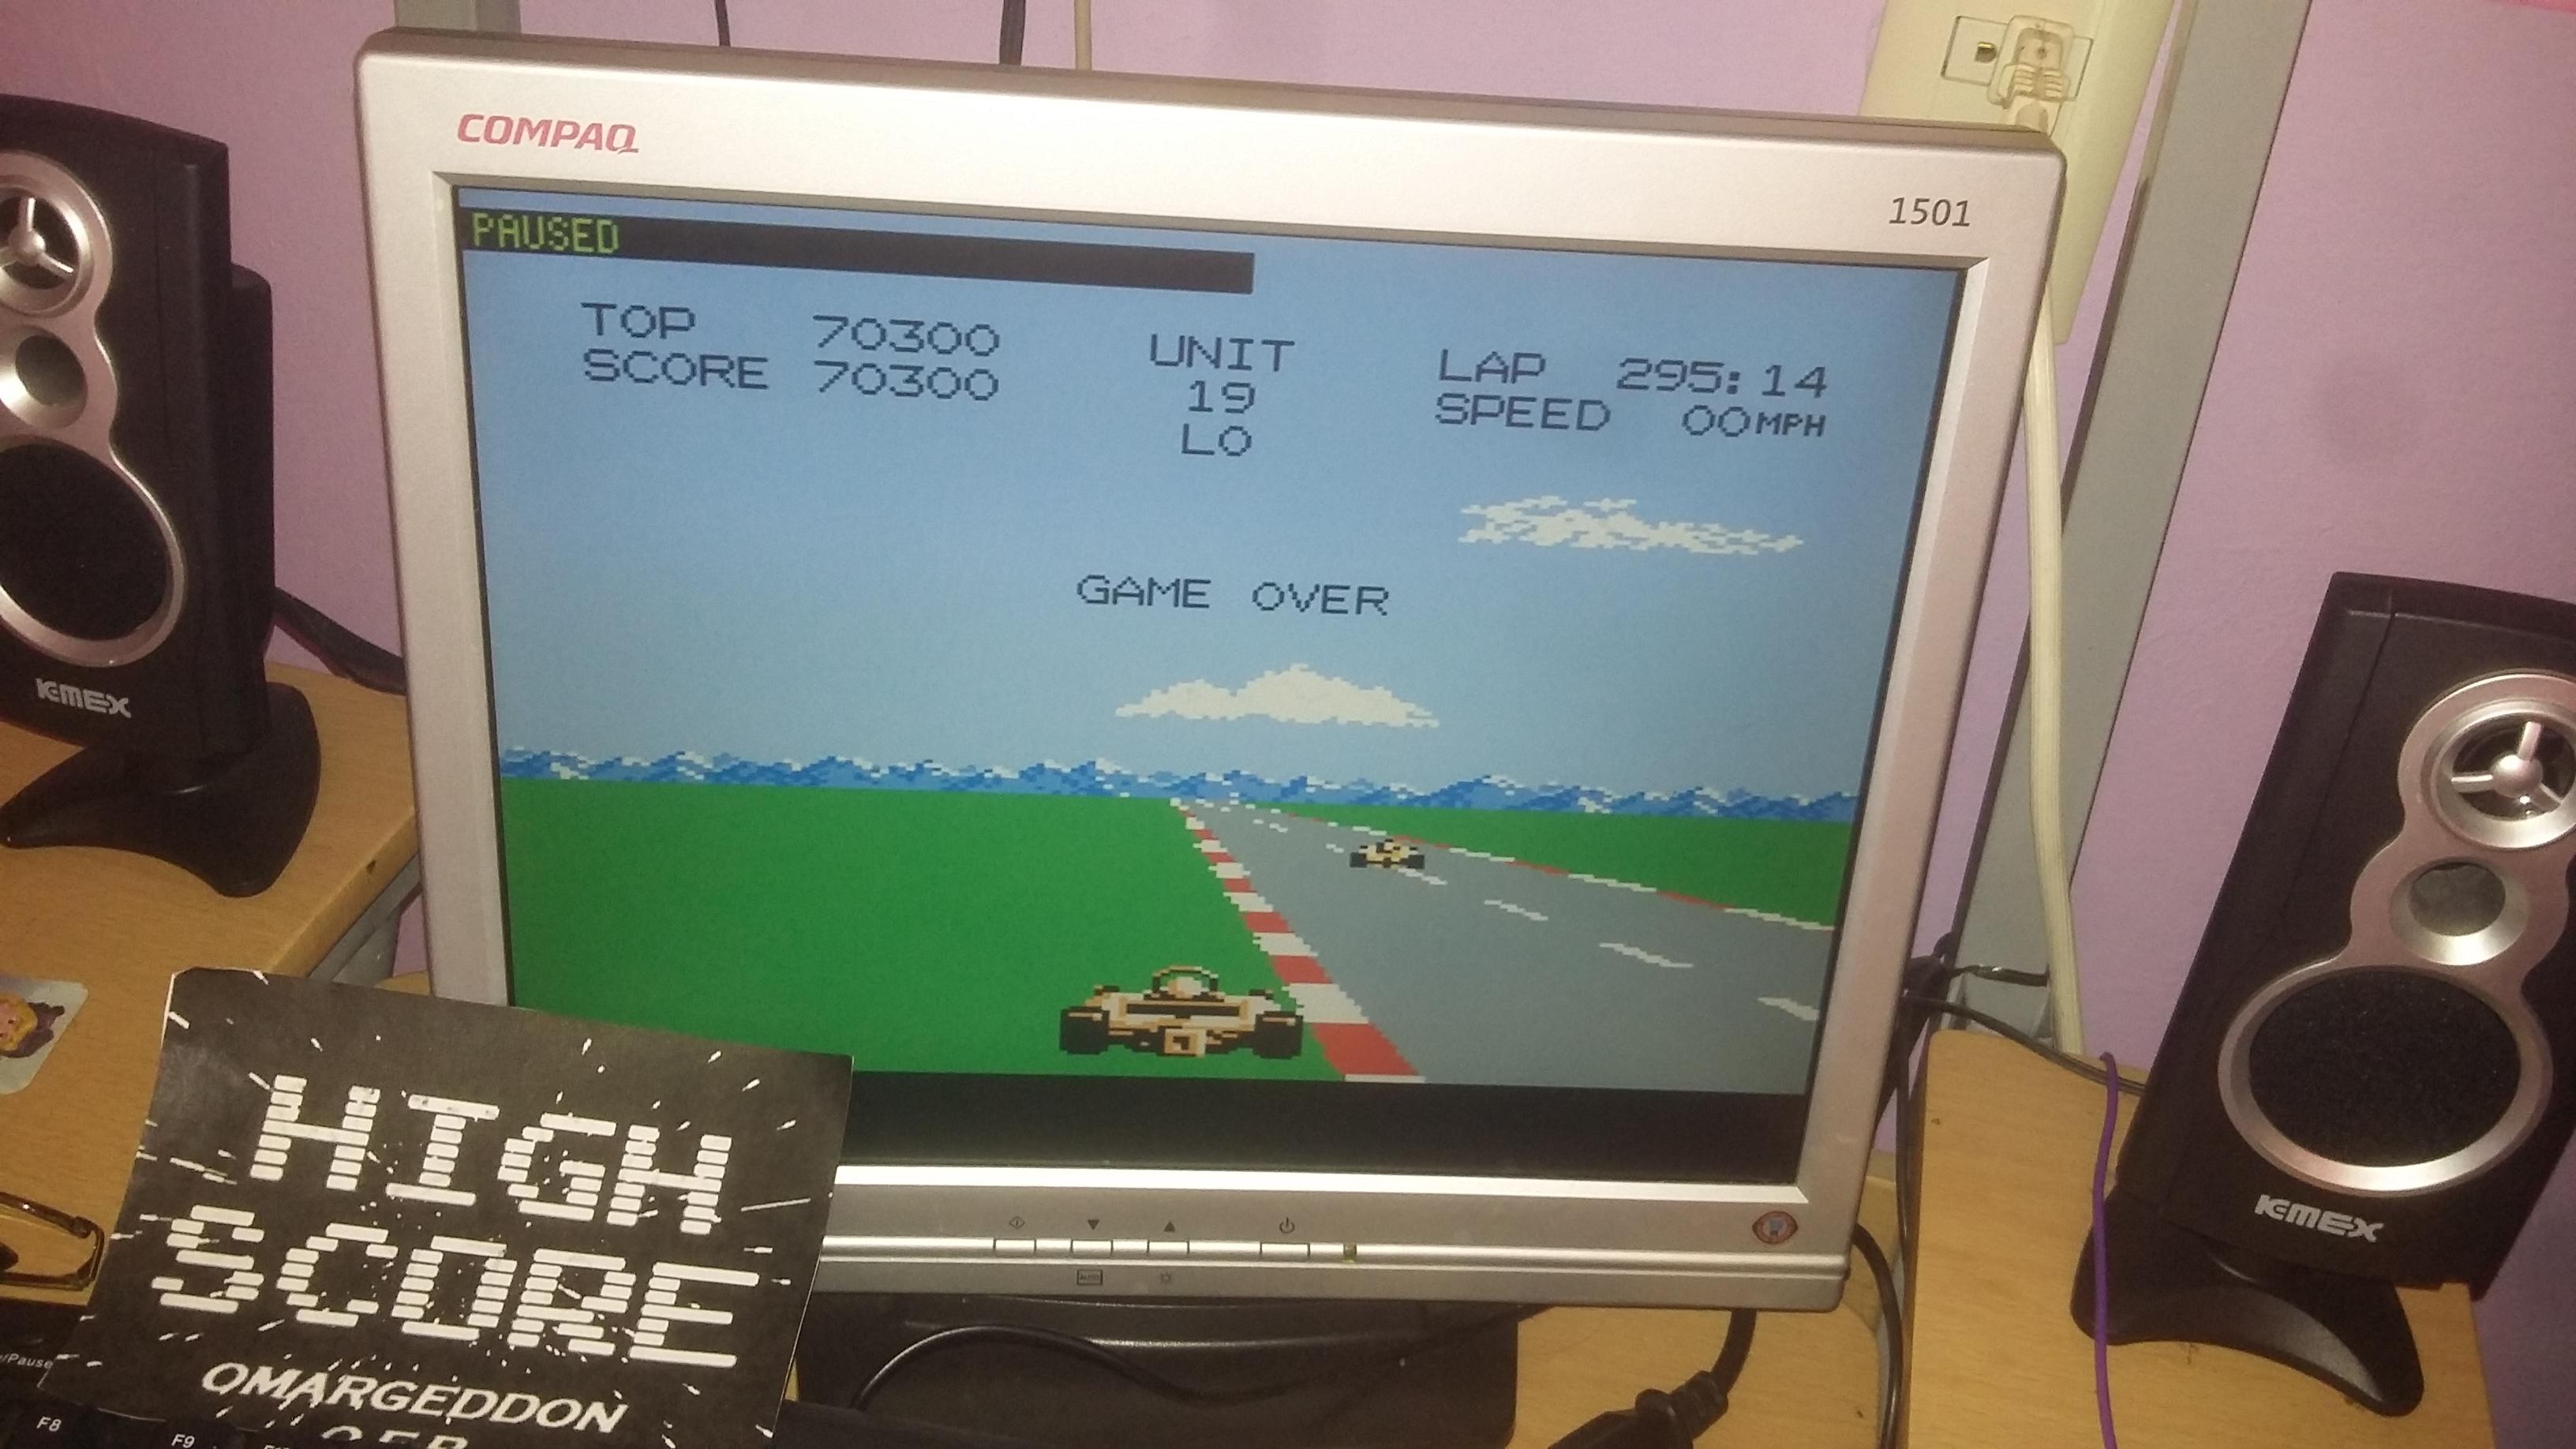 omargeddon: Pole Position 2: Fuji (Atari 7800 Emulated) 70,300 points on 2016-10-11 18:01:29